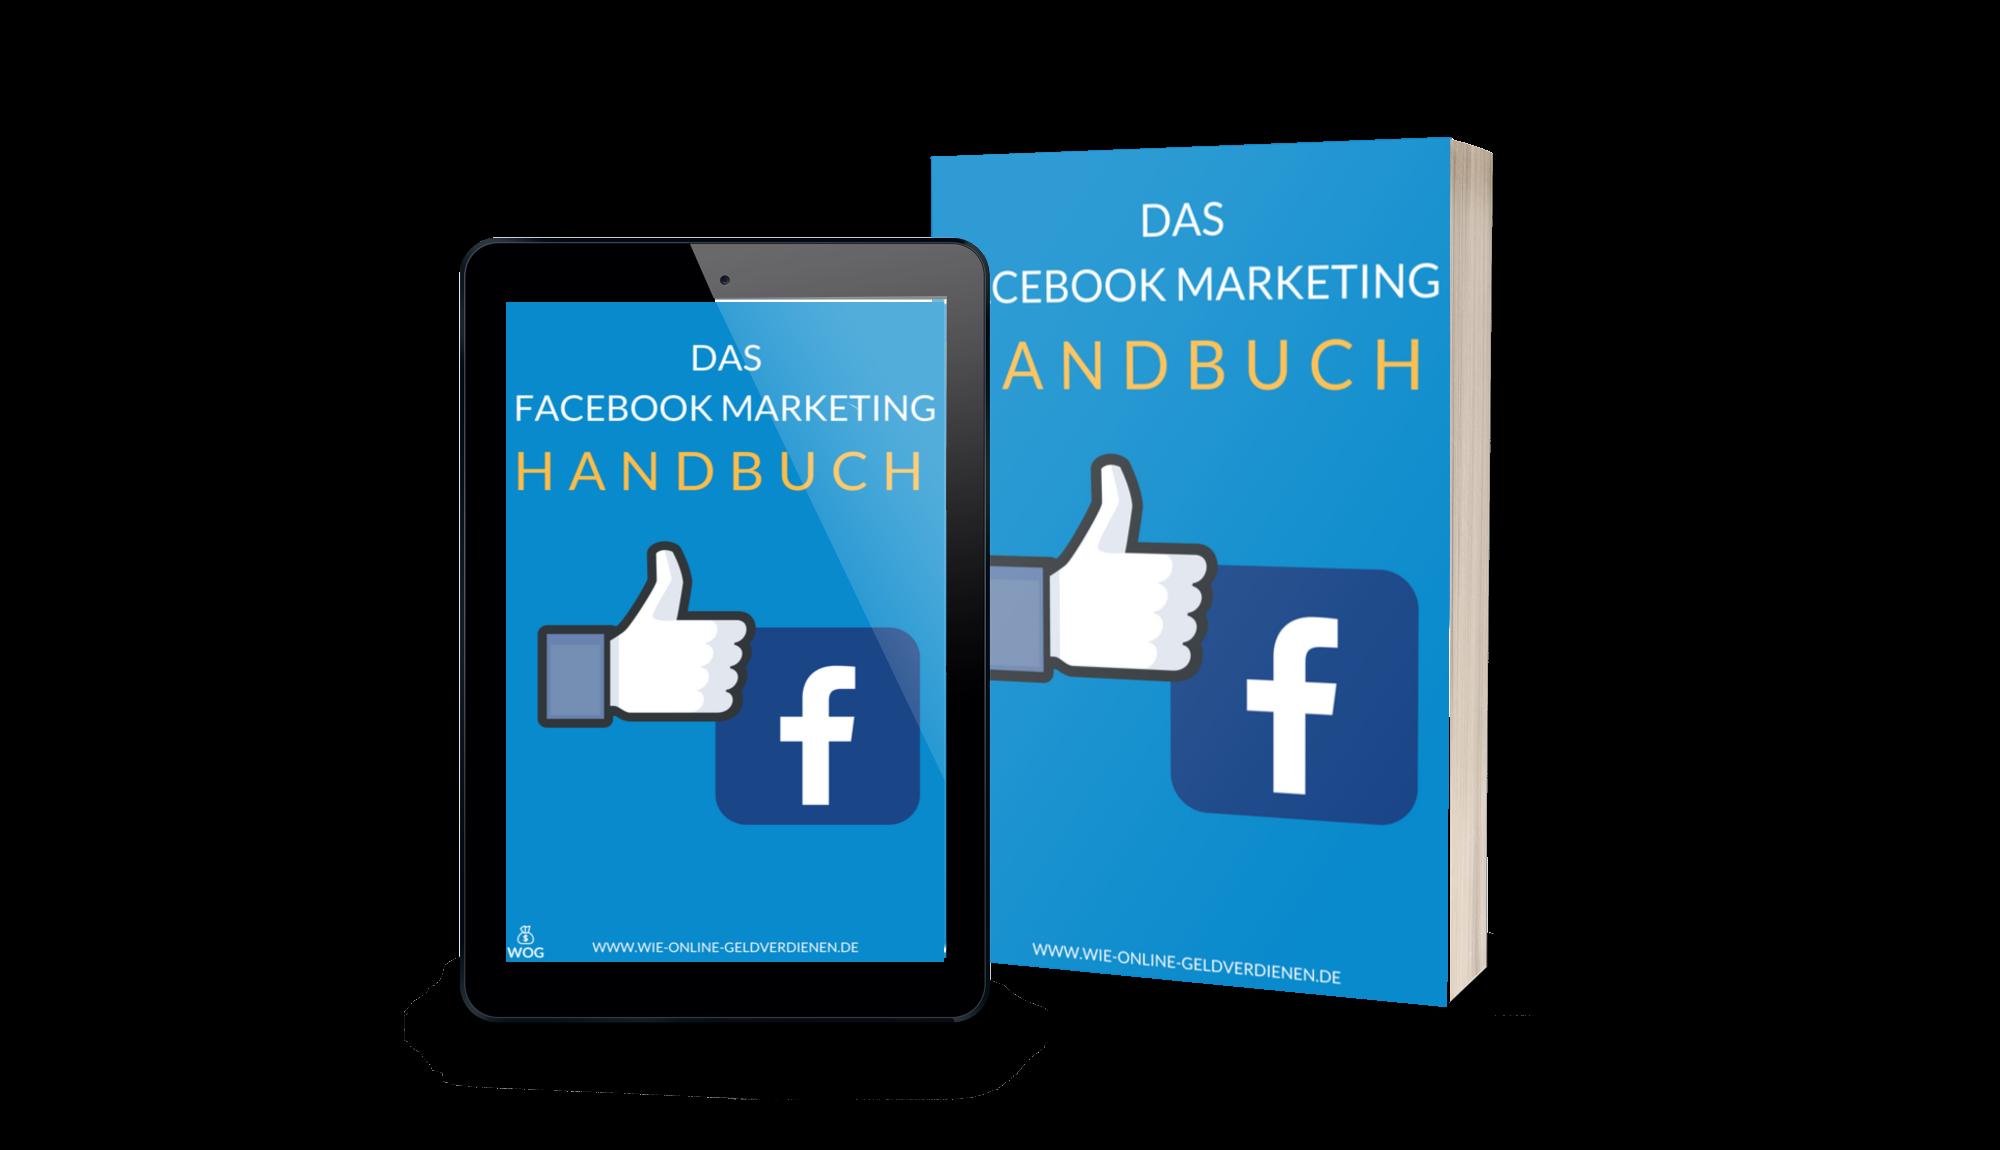 Wie-Online-Geldverdienen.de, Facebook Marketing Handbuch Cover